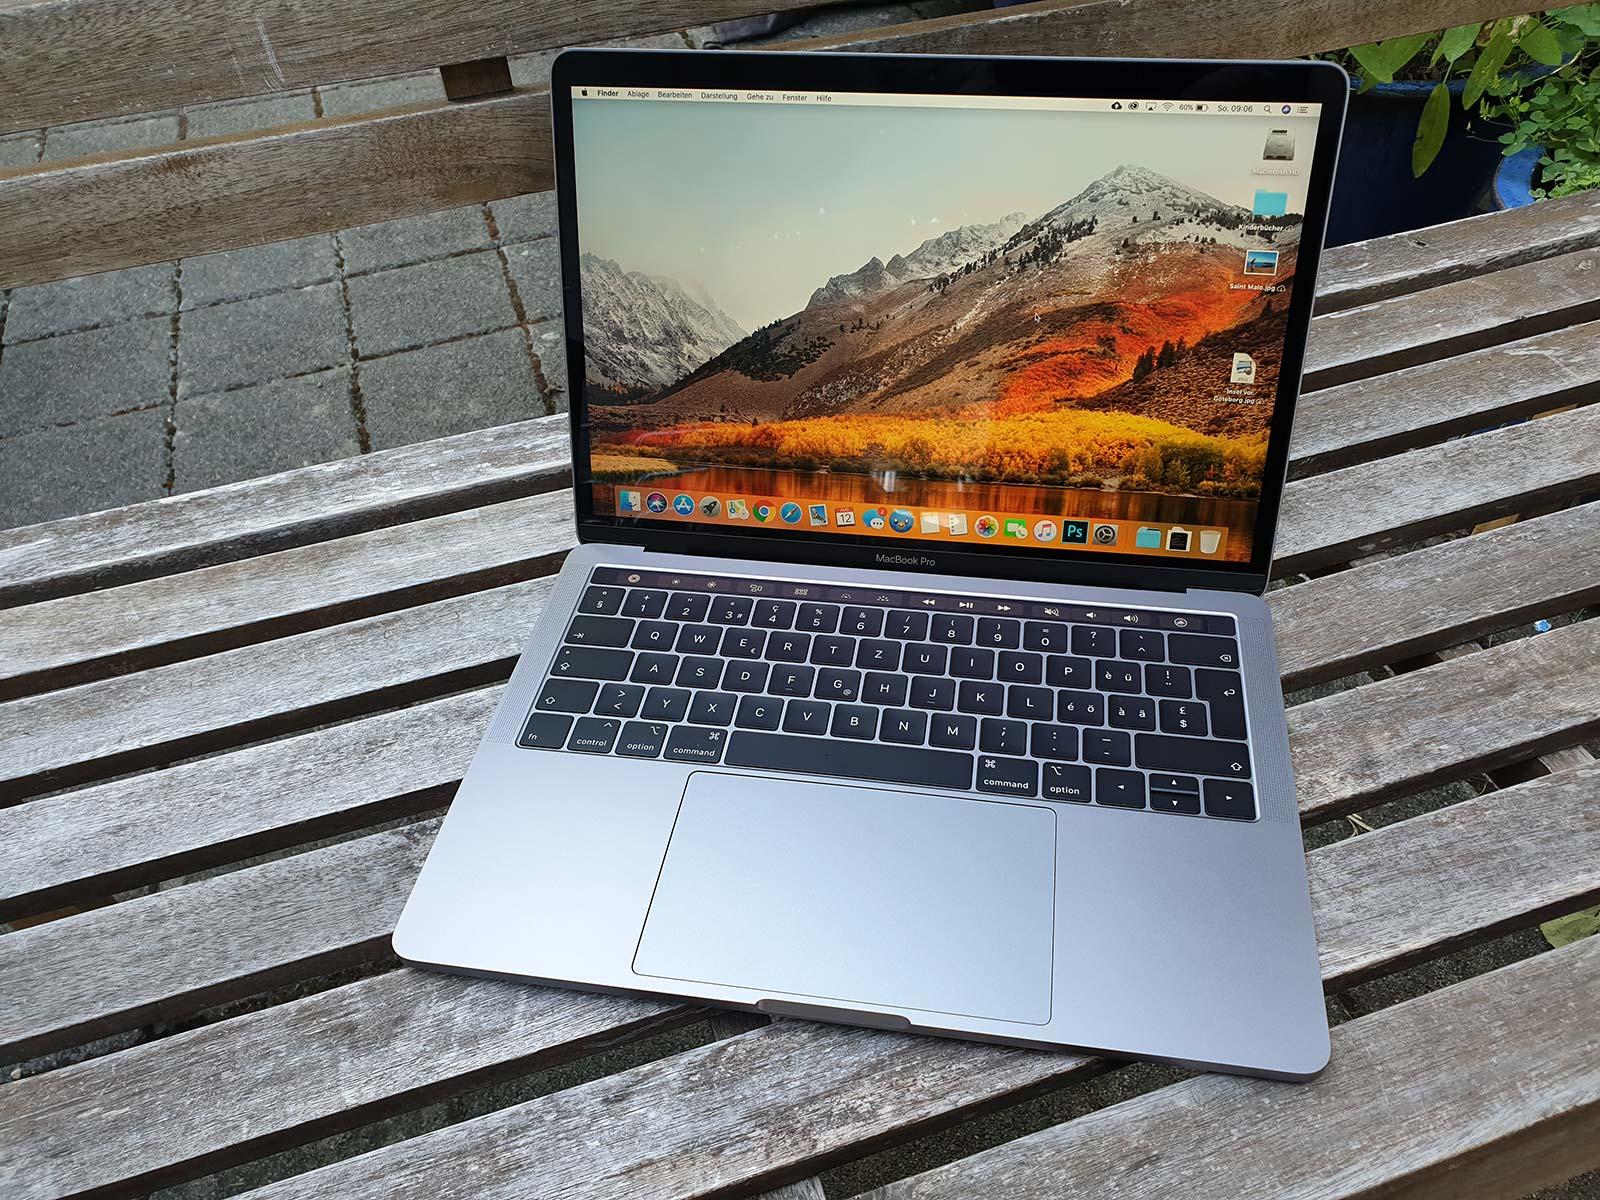 Macbook Pro 2018 Getestet Workstation Power Fur Unterwegs Ifrick Ch Nothing But Techifrick Ch Nothing But Tech